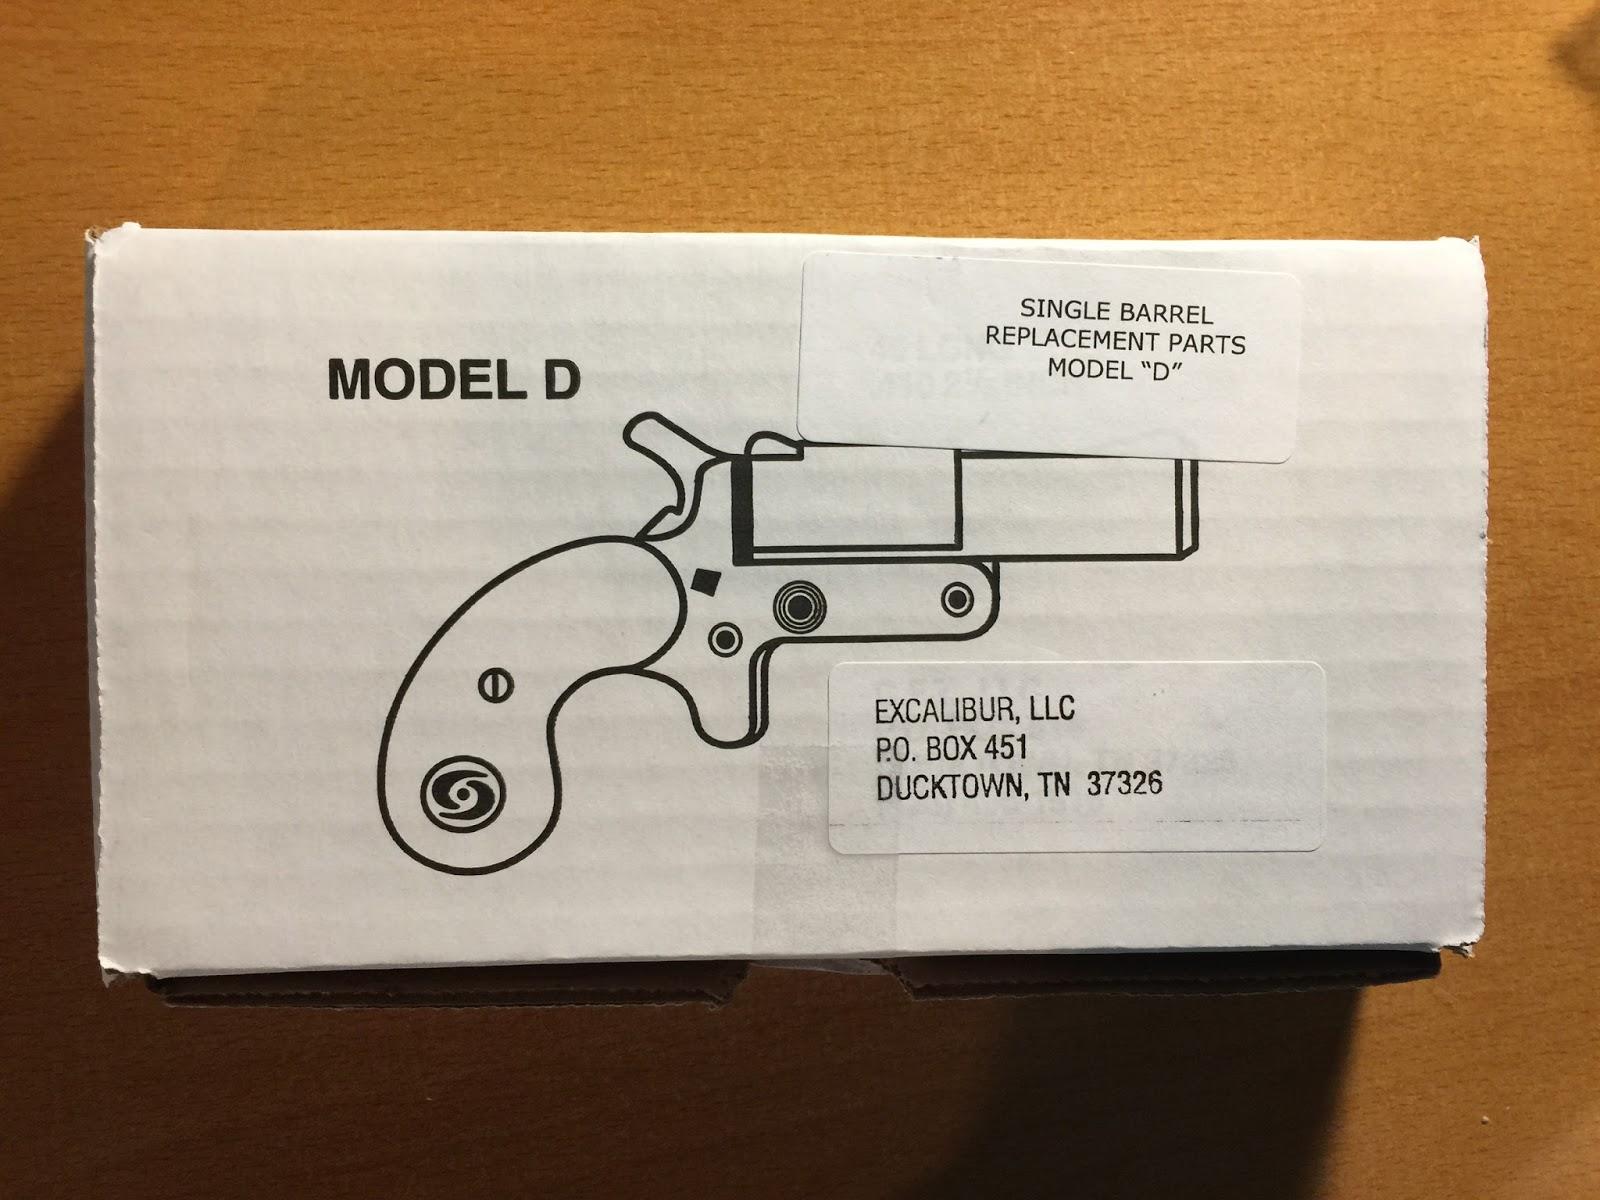 TINCANBANDIT's Gunsmithing: The Cobray Model D Project